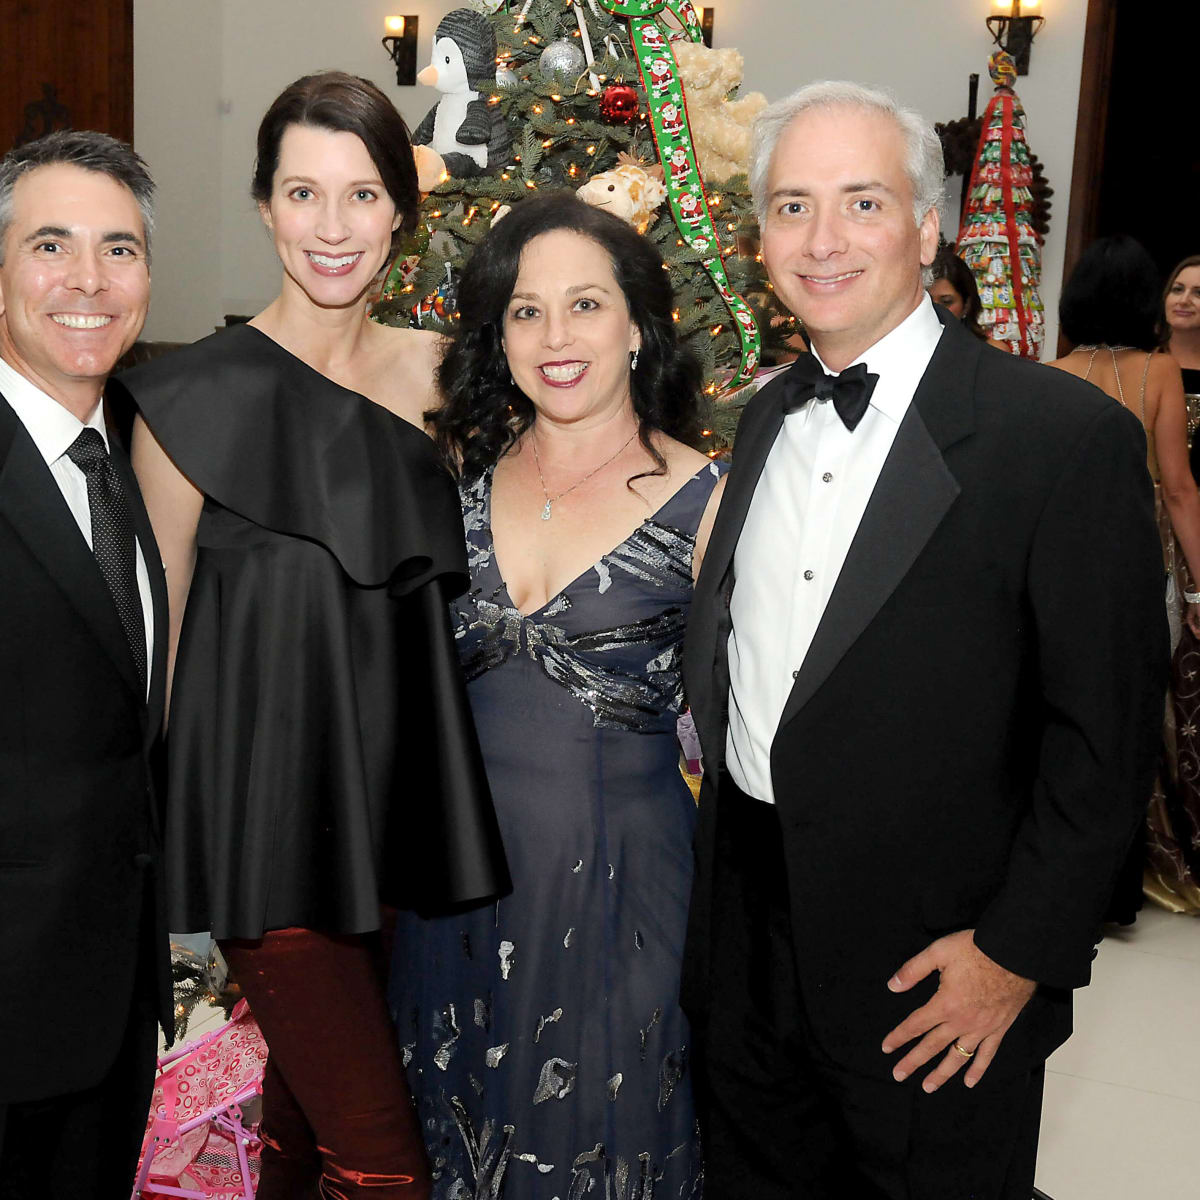 Houston, Trees of Hope gala, Nov. 2016, Steve Jones, Laura Jones, Viviana Denechaud, David Denechaud